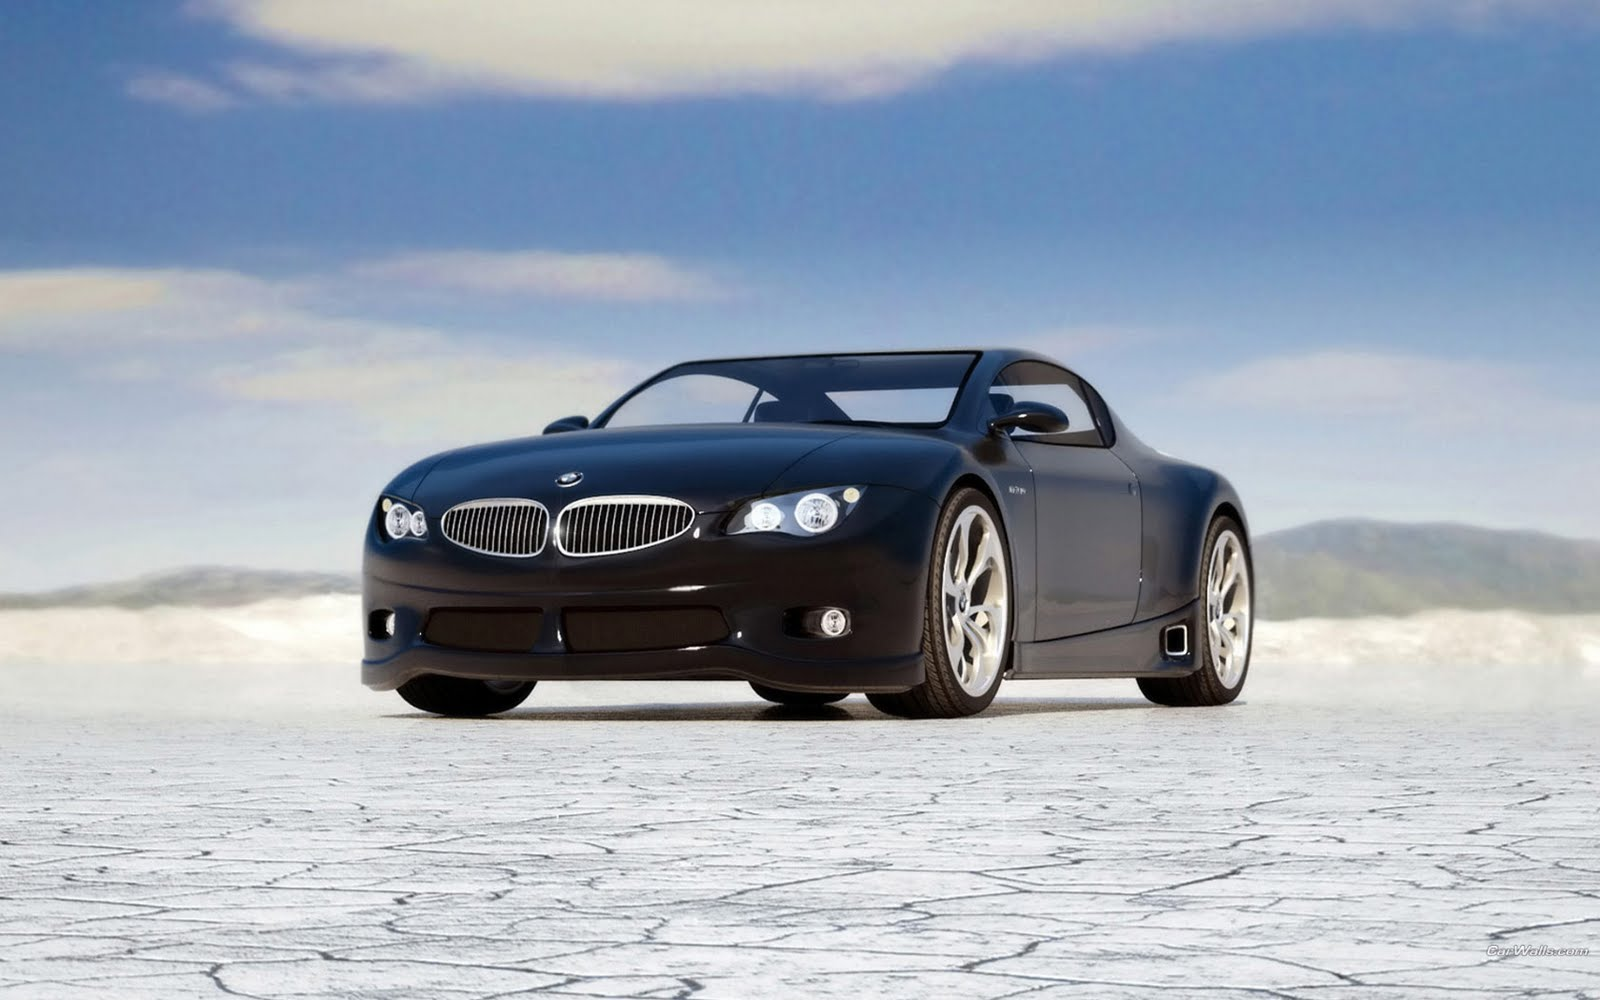 http://1.bp.blogspot.com/-ONBUno3xutU/TgOJ67YcTjI/AAAAAAAAArU/F27VbNp1dWQ/s1600/BMW_M_Zero_Concept_wallpaper_1_BMW_M_Zero_Concept.jpg